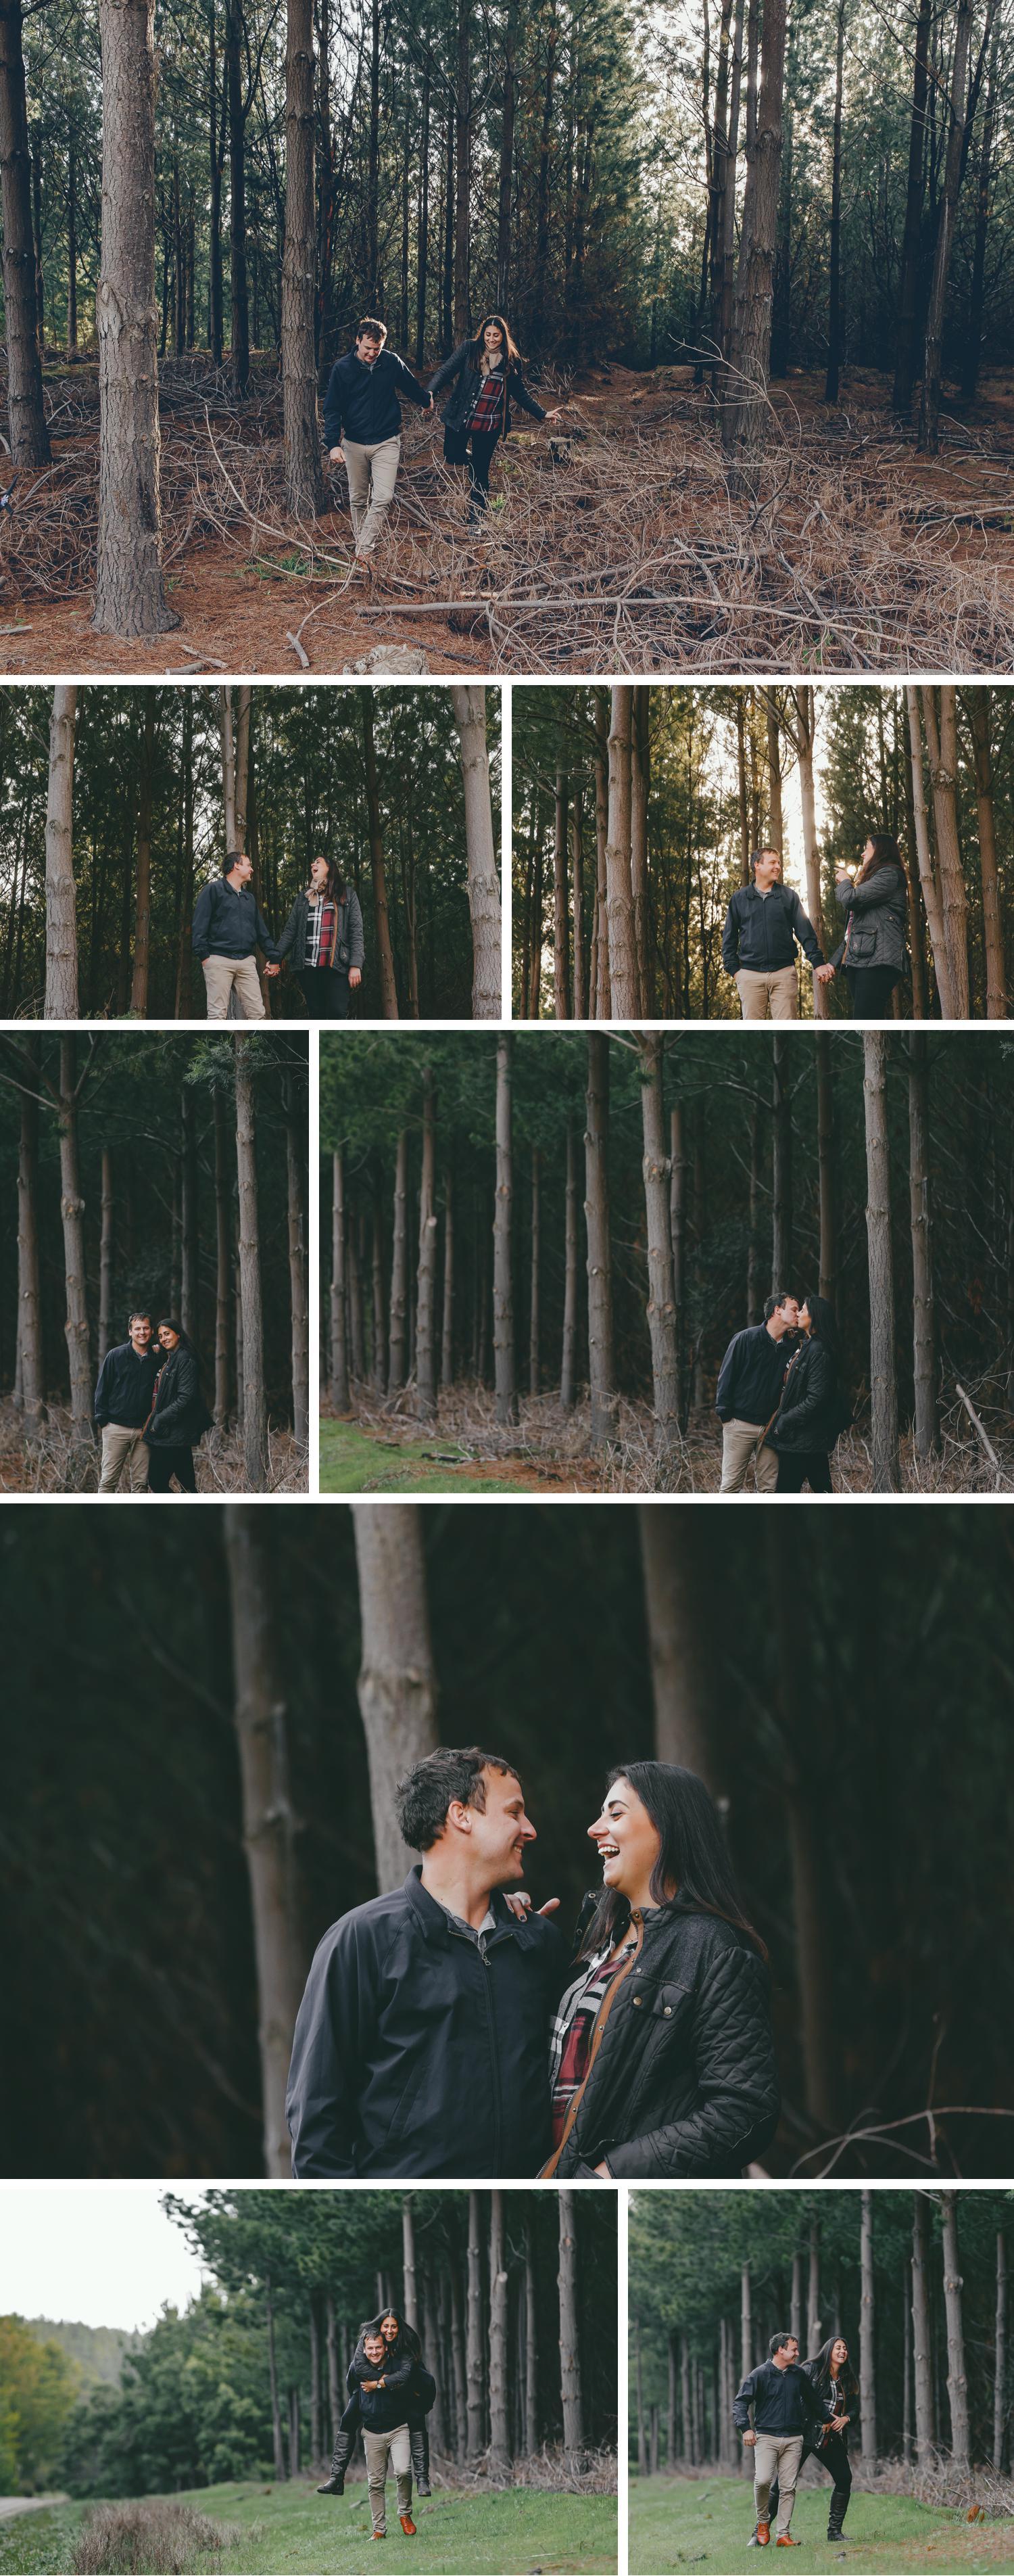 Pine Plantation, Engagement Shoot, Forrest Rain Photoshoot, Couple Embracing by Danae Studios